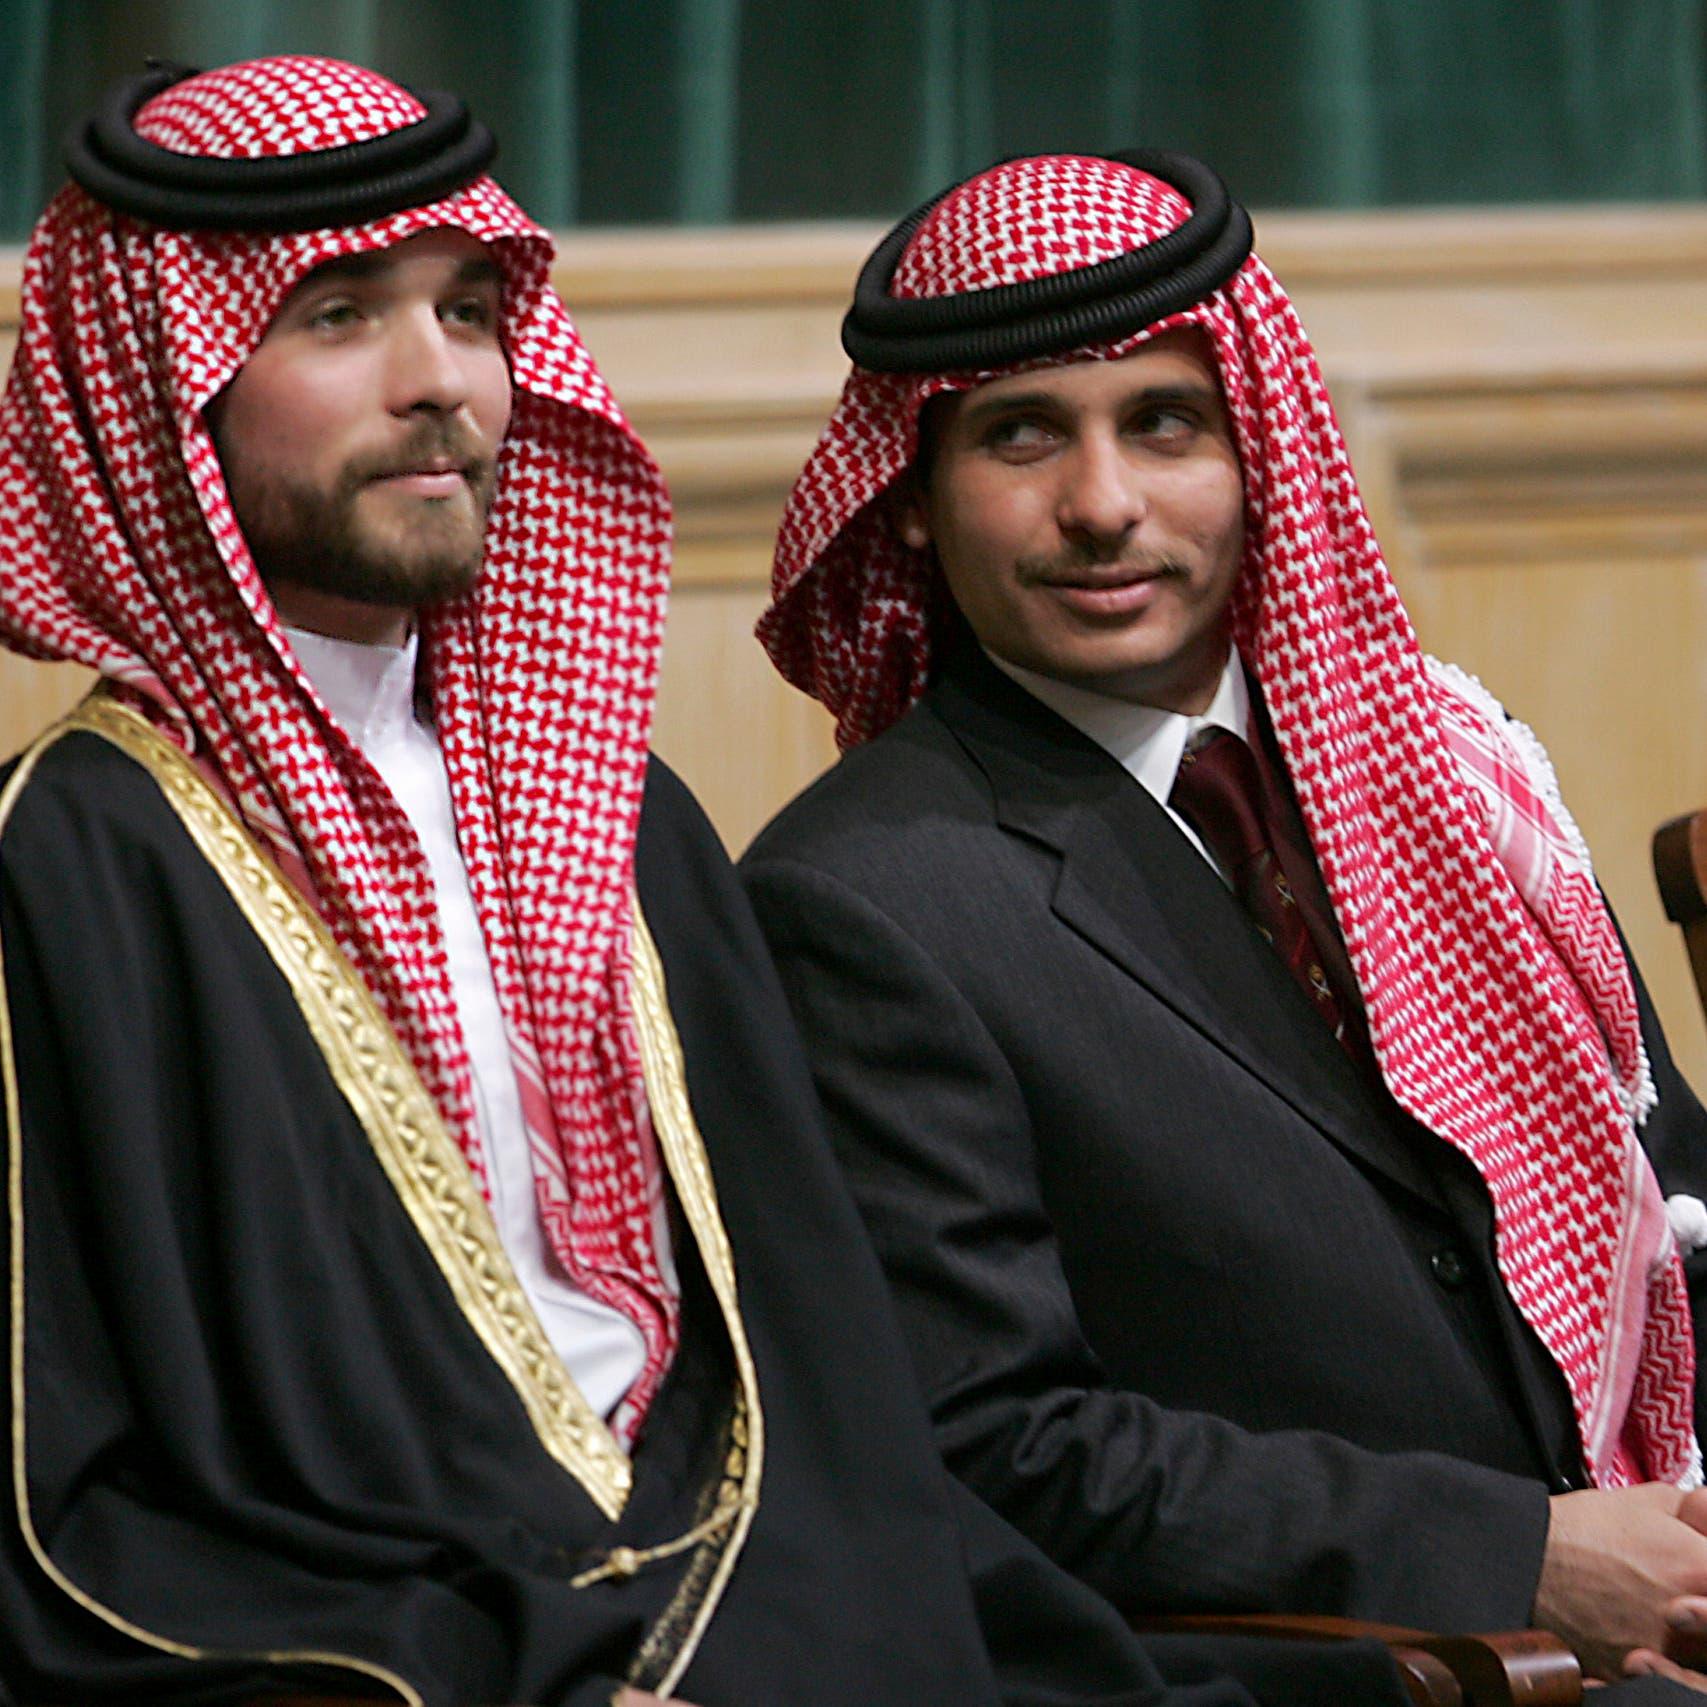 Jordan bans media coverage of Prince Hamzah ordeal amid ongoing investigation